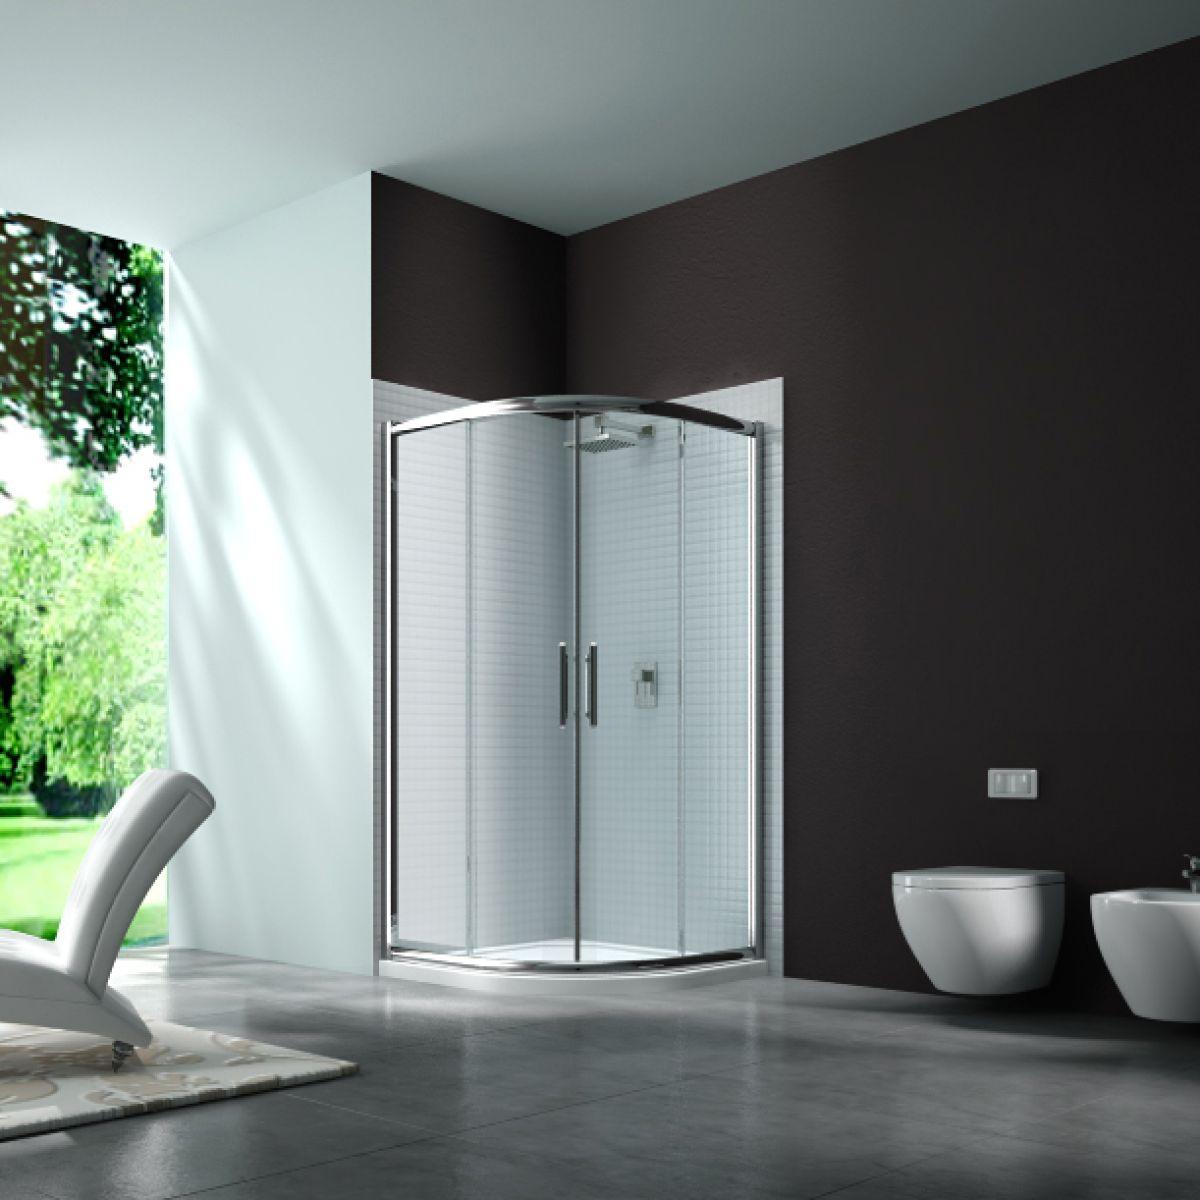 Merlyn Series 6 Double Door Quadrant Shower Enclosure